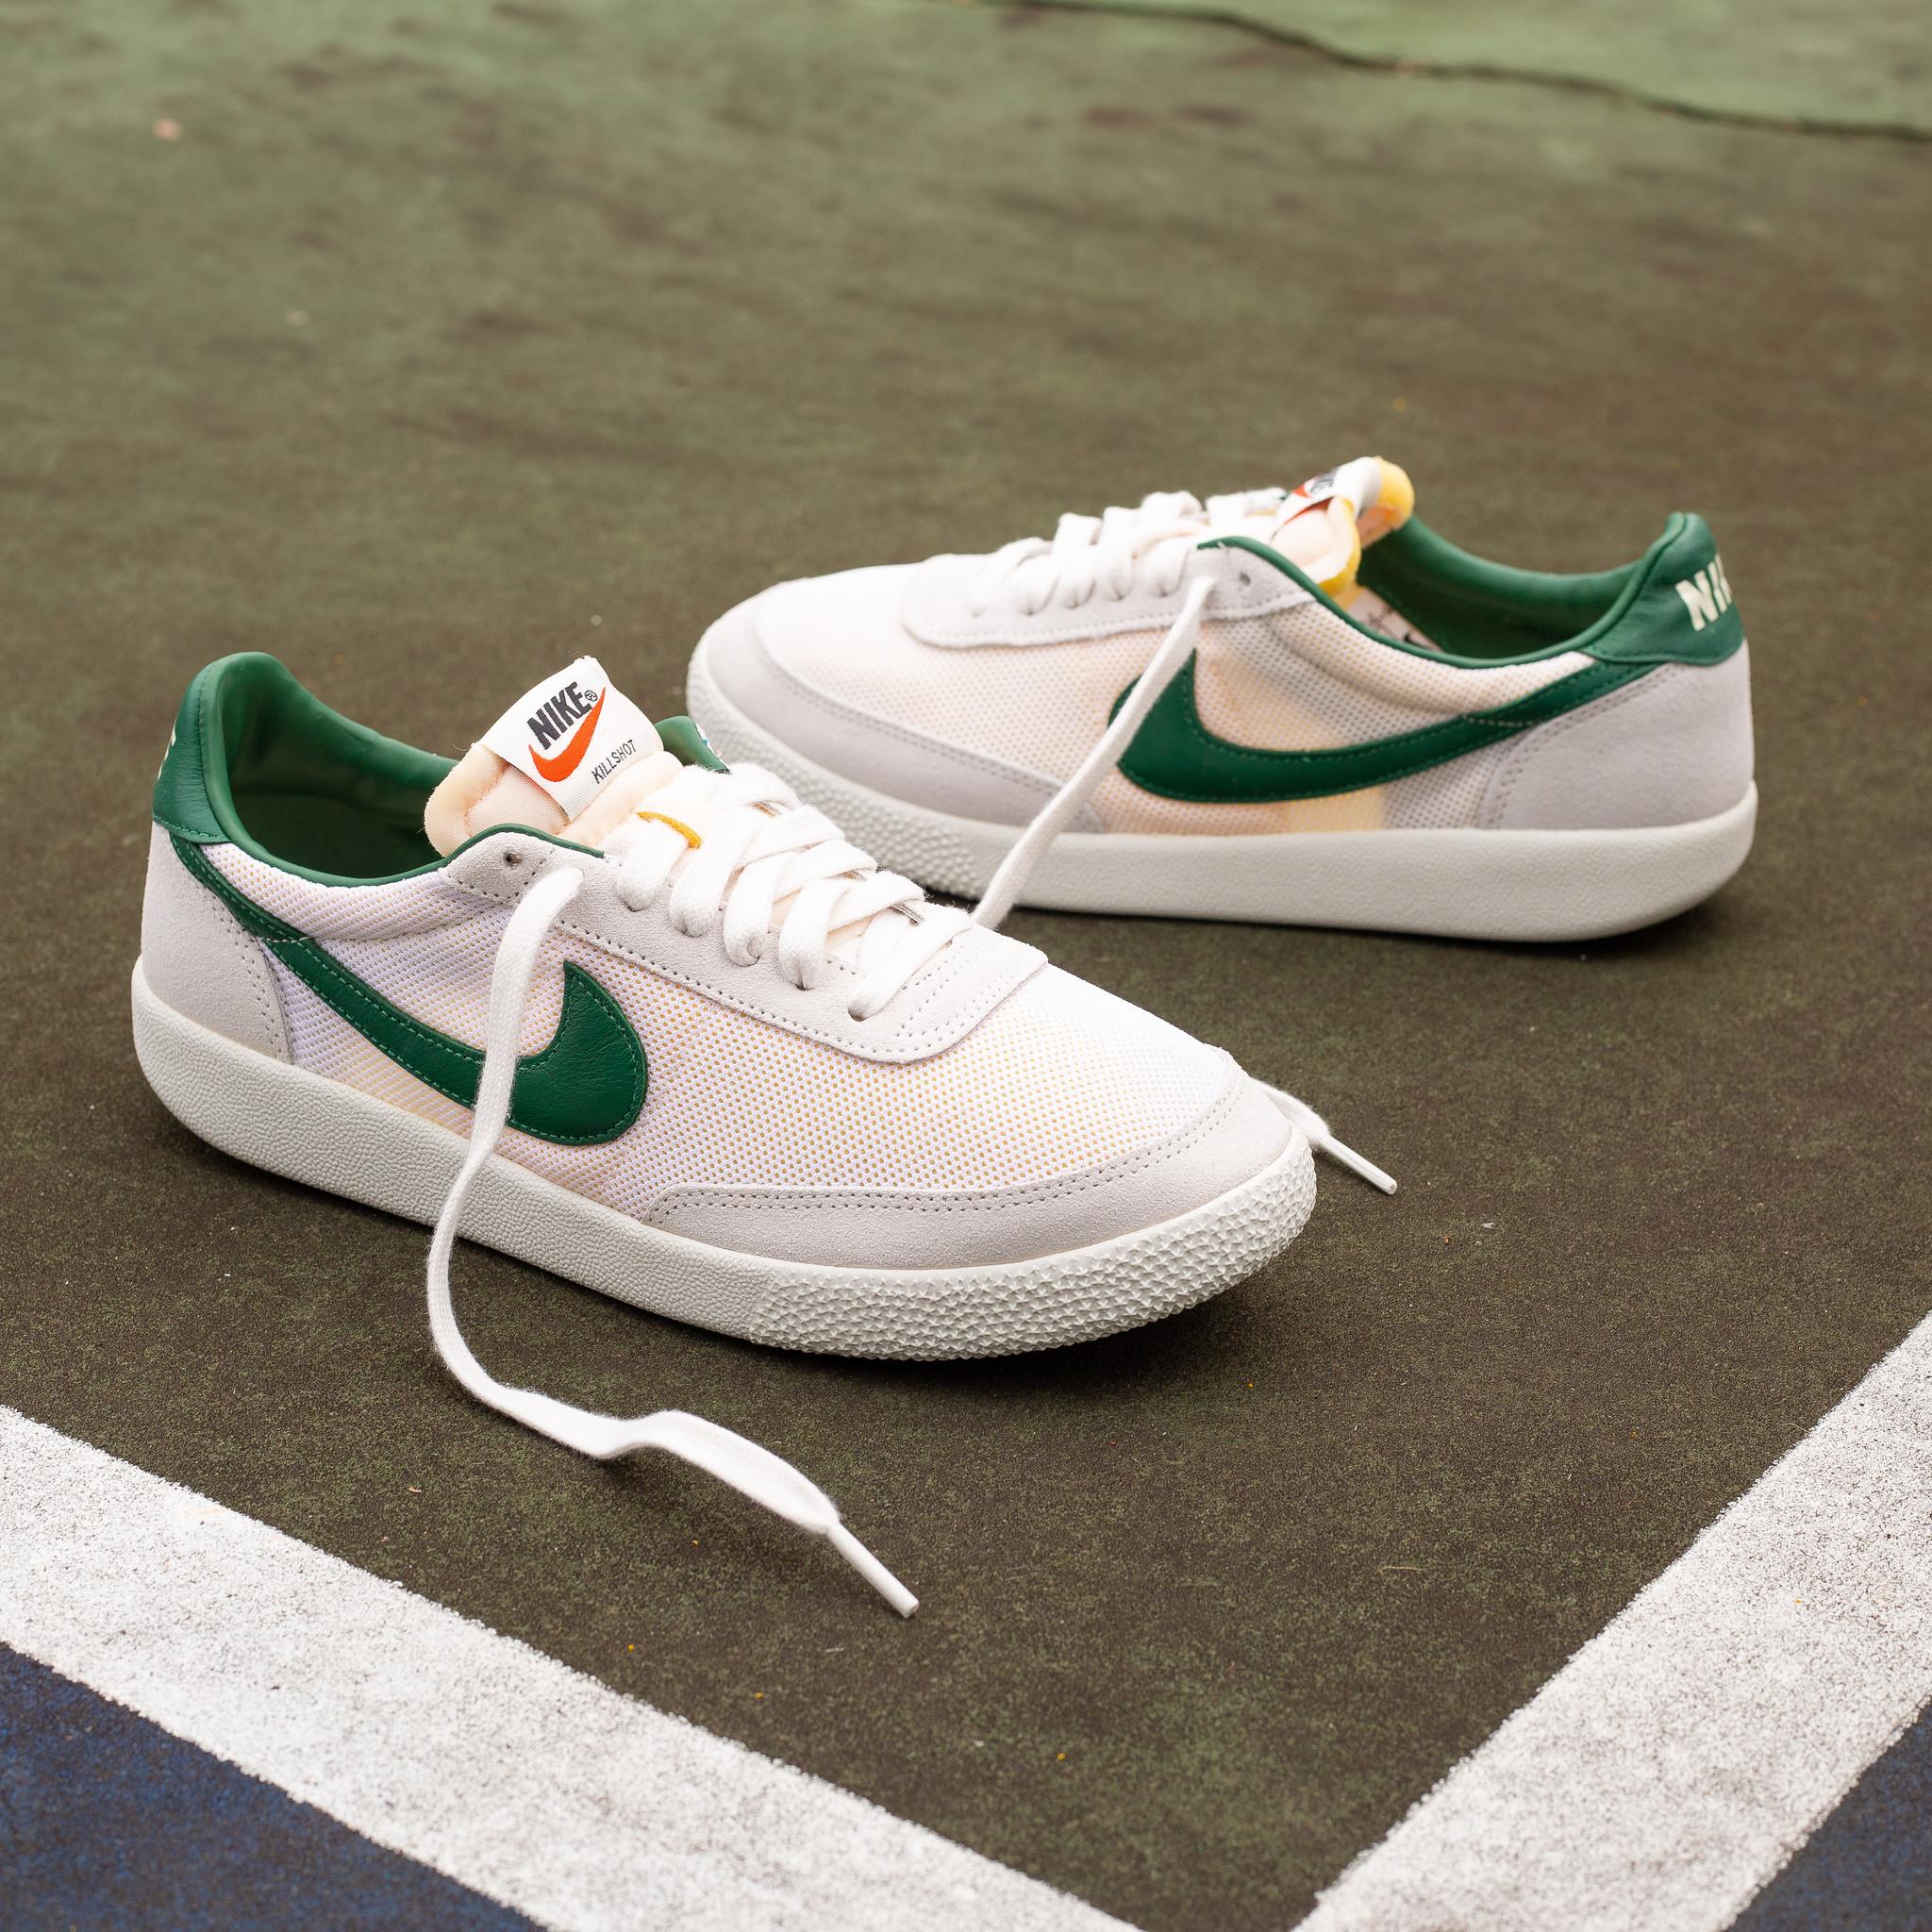 Nike Killshot OG SP Sail/George Green